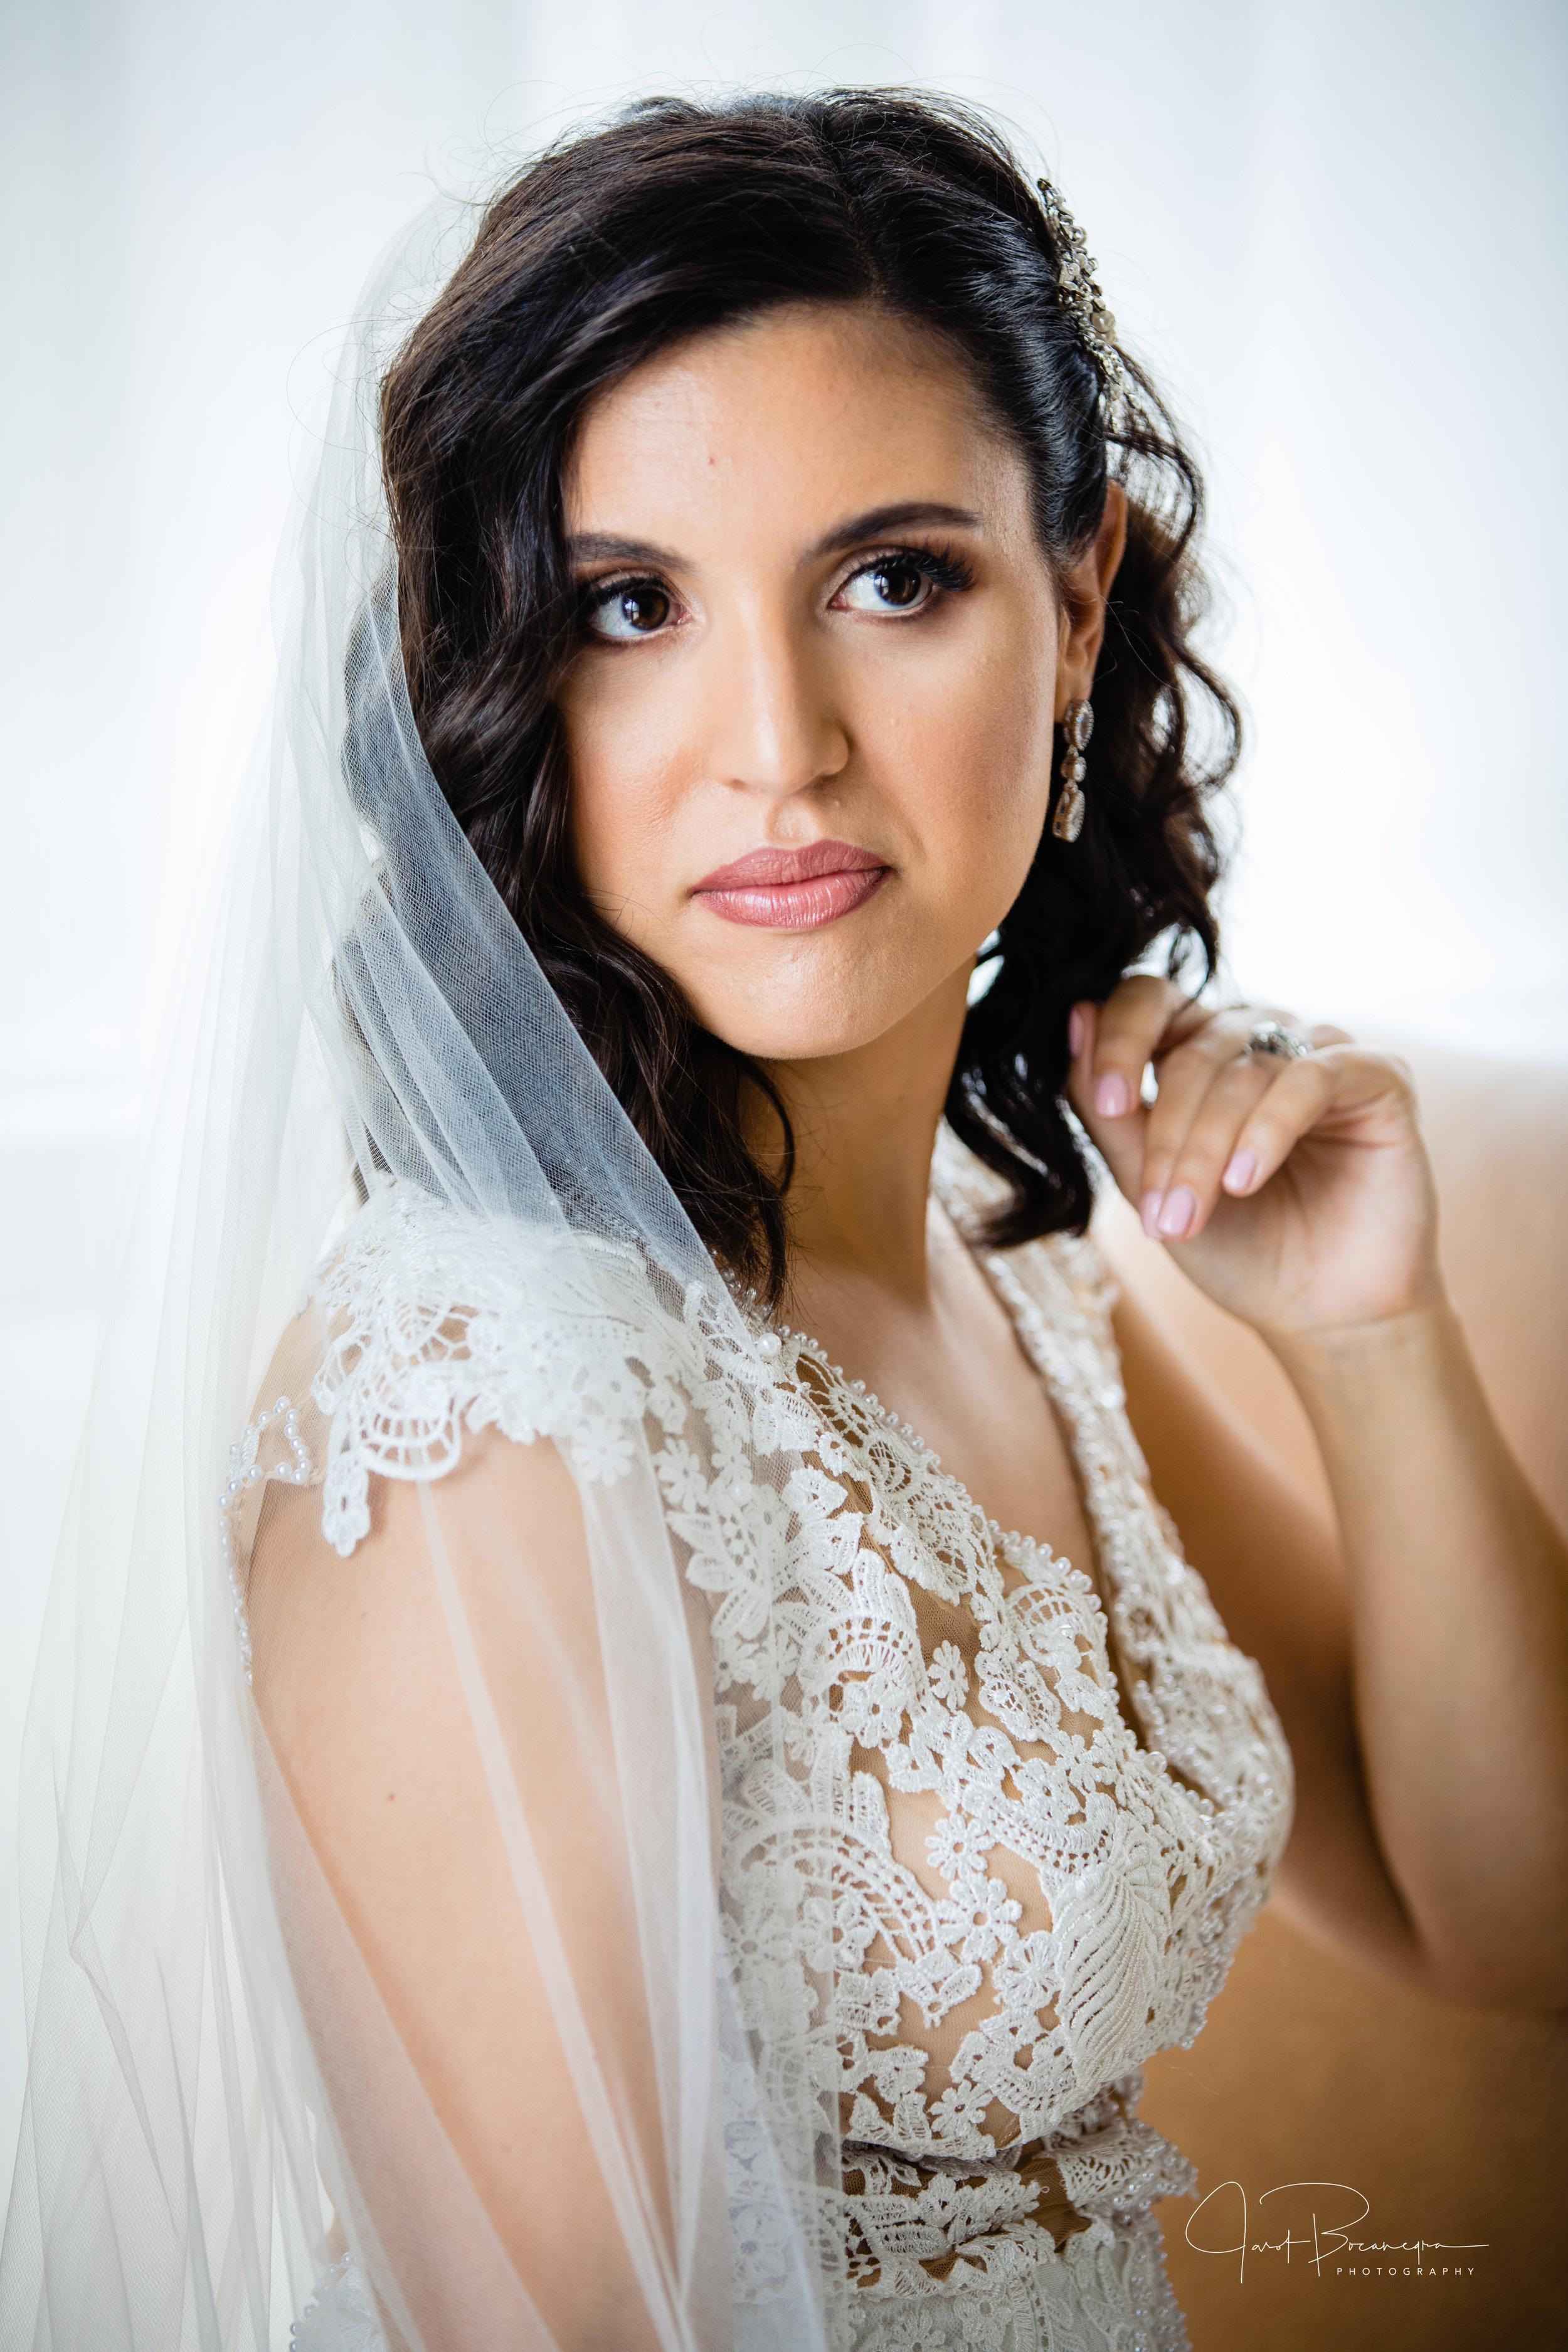 NJ WEDDING PHOTOGRAPHER